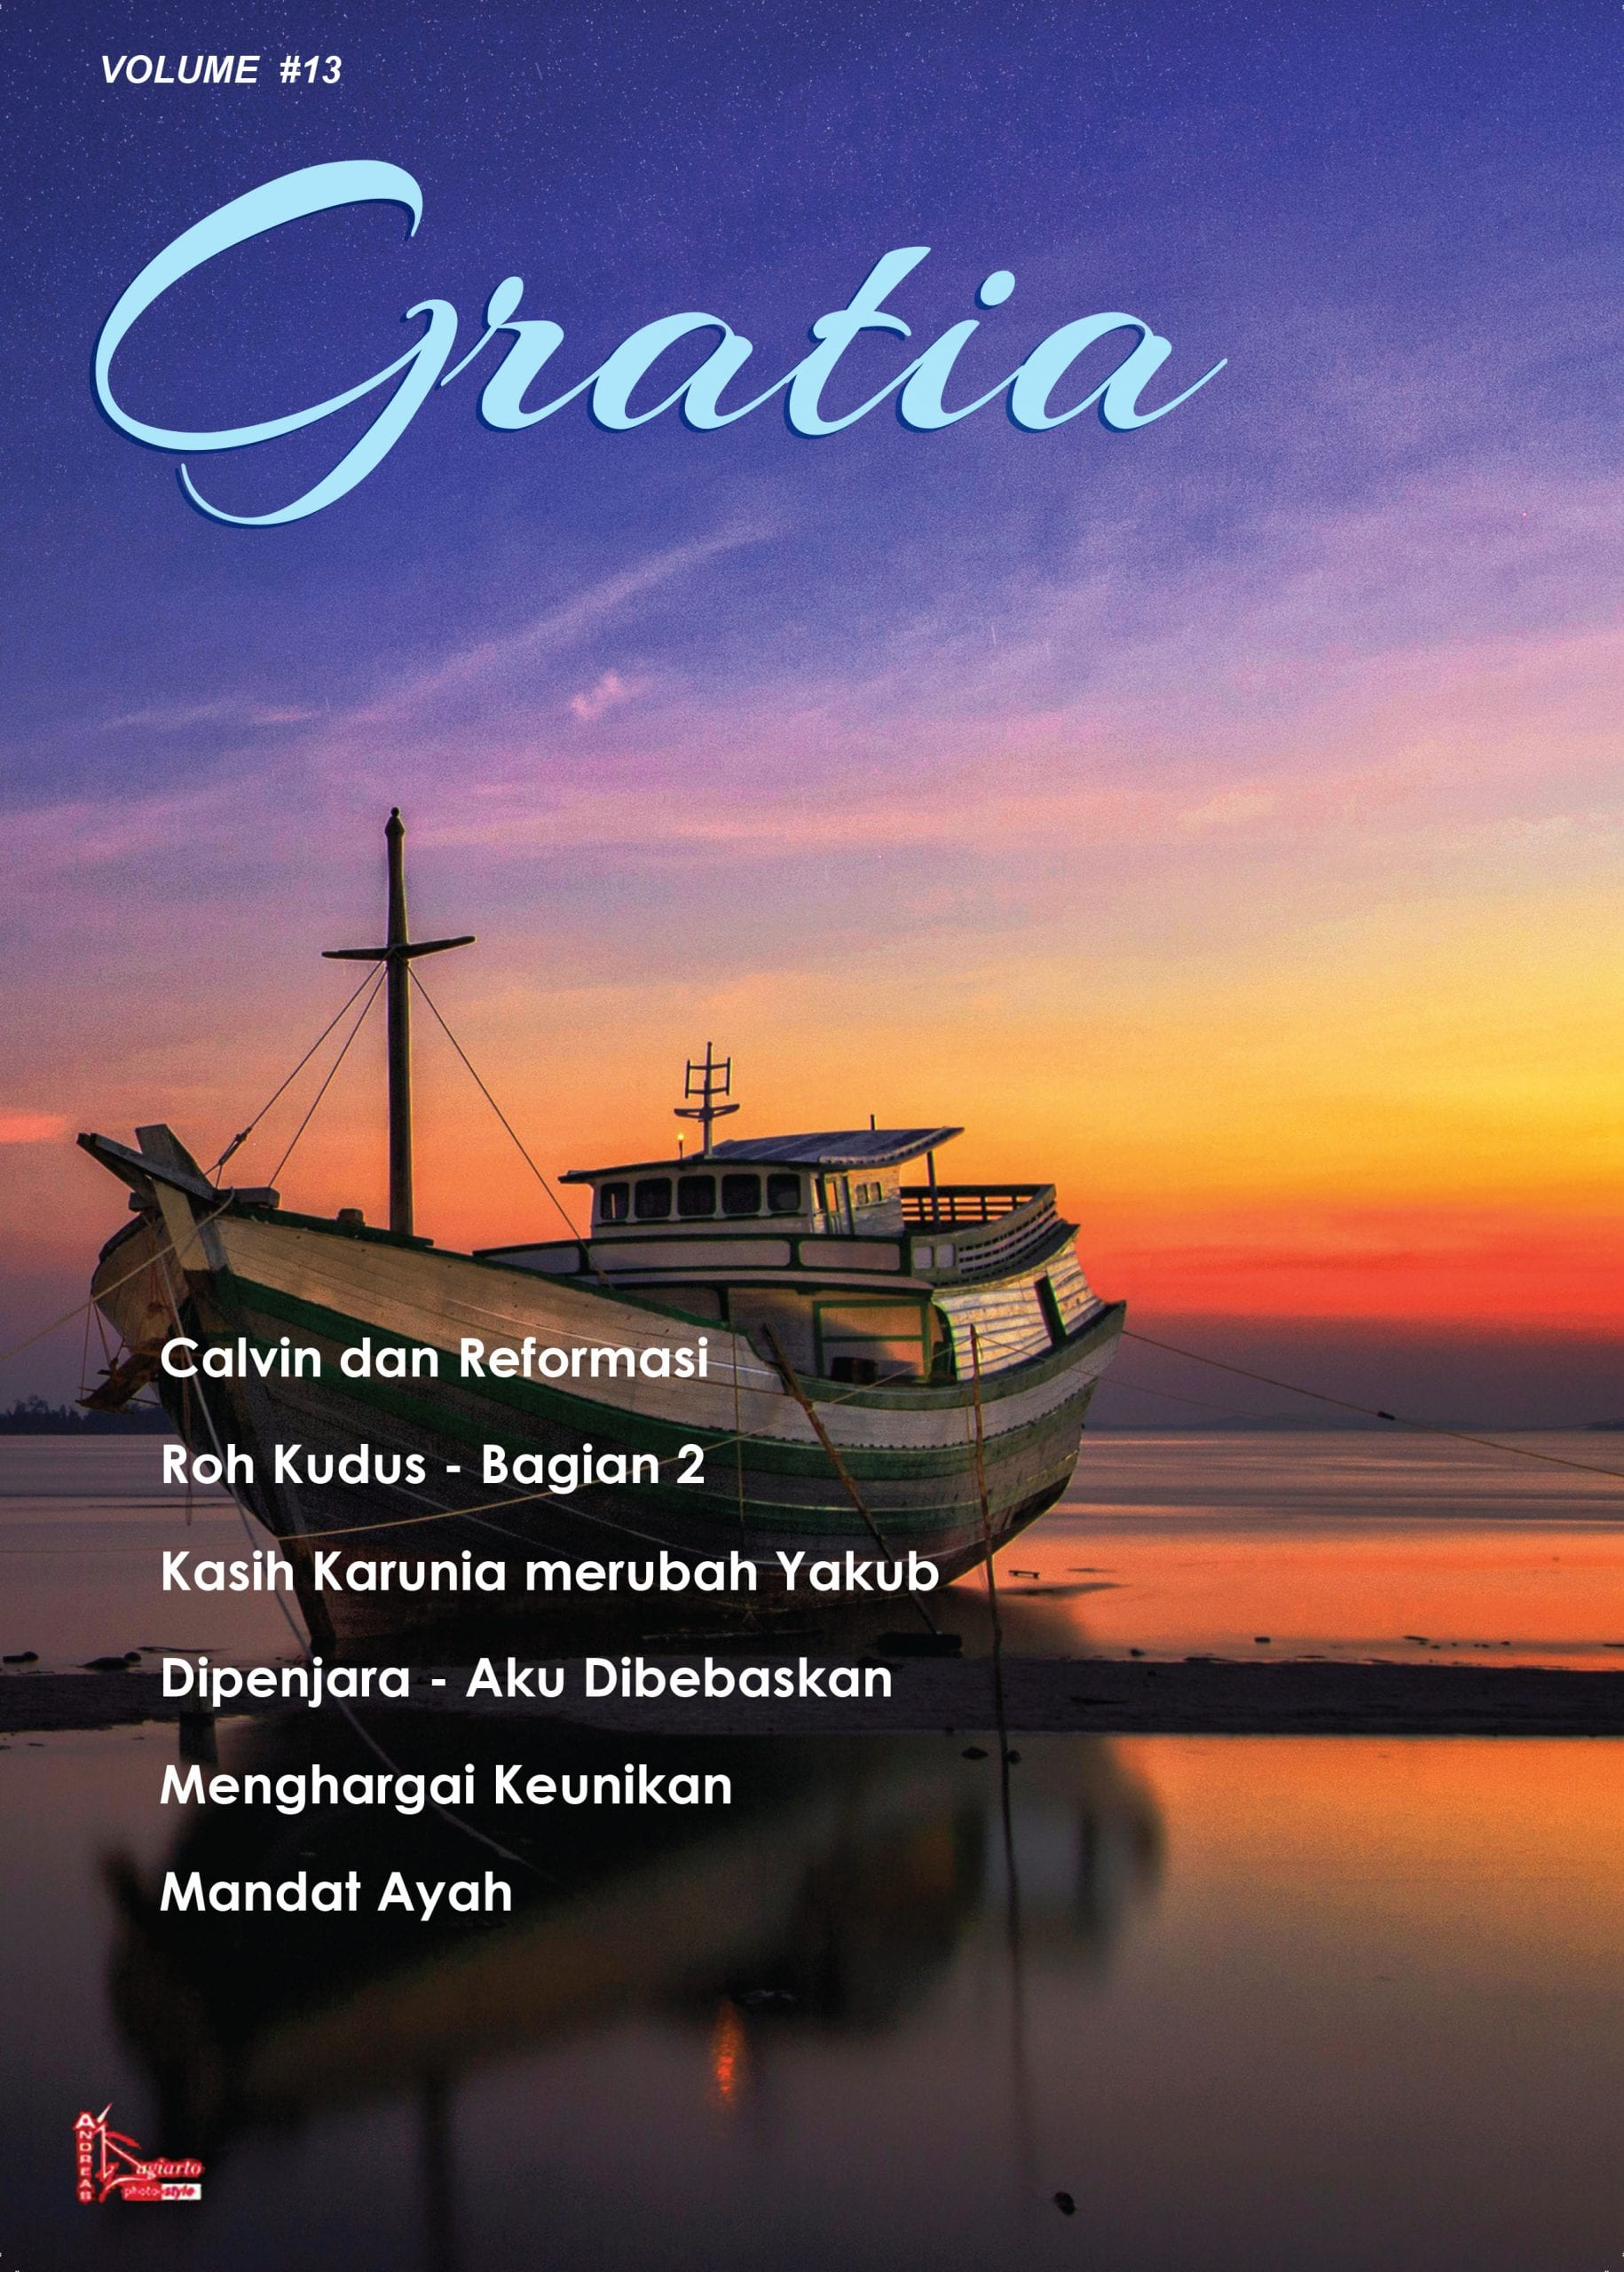 cover gratia 13 final 1 jpg1512197645 scaled